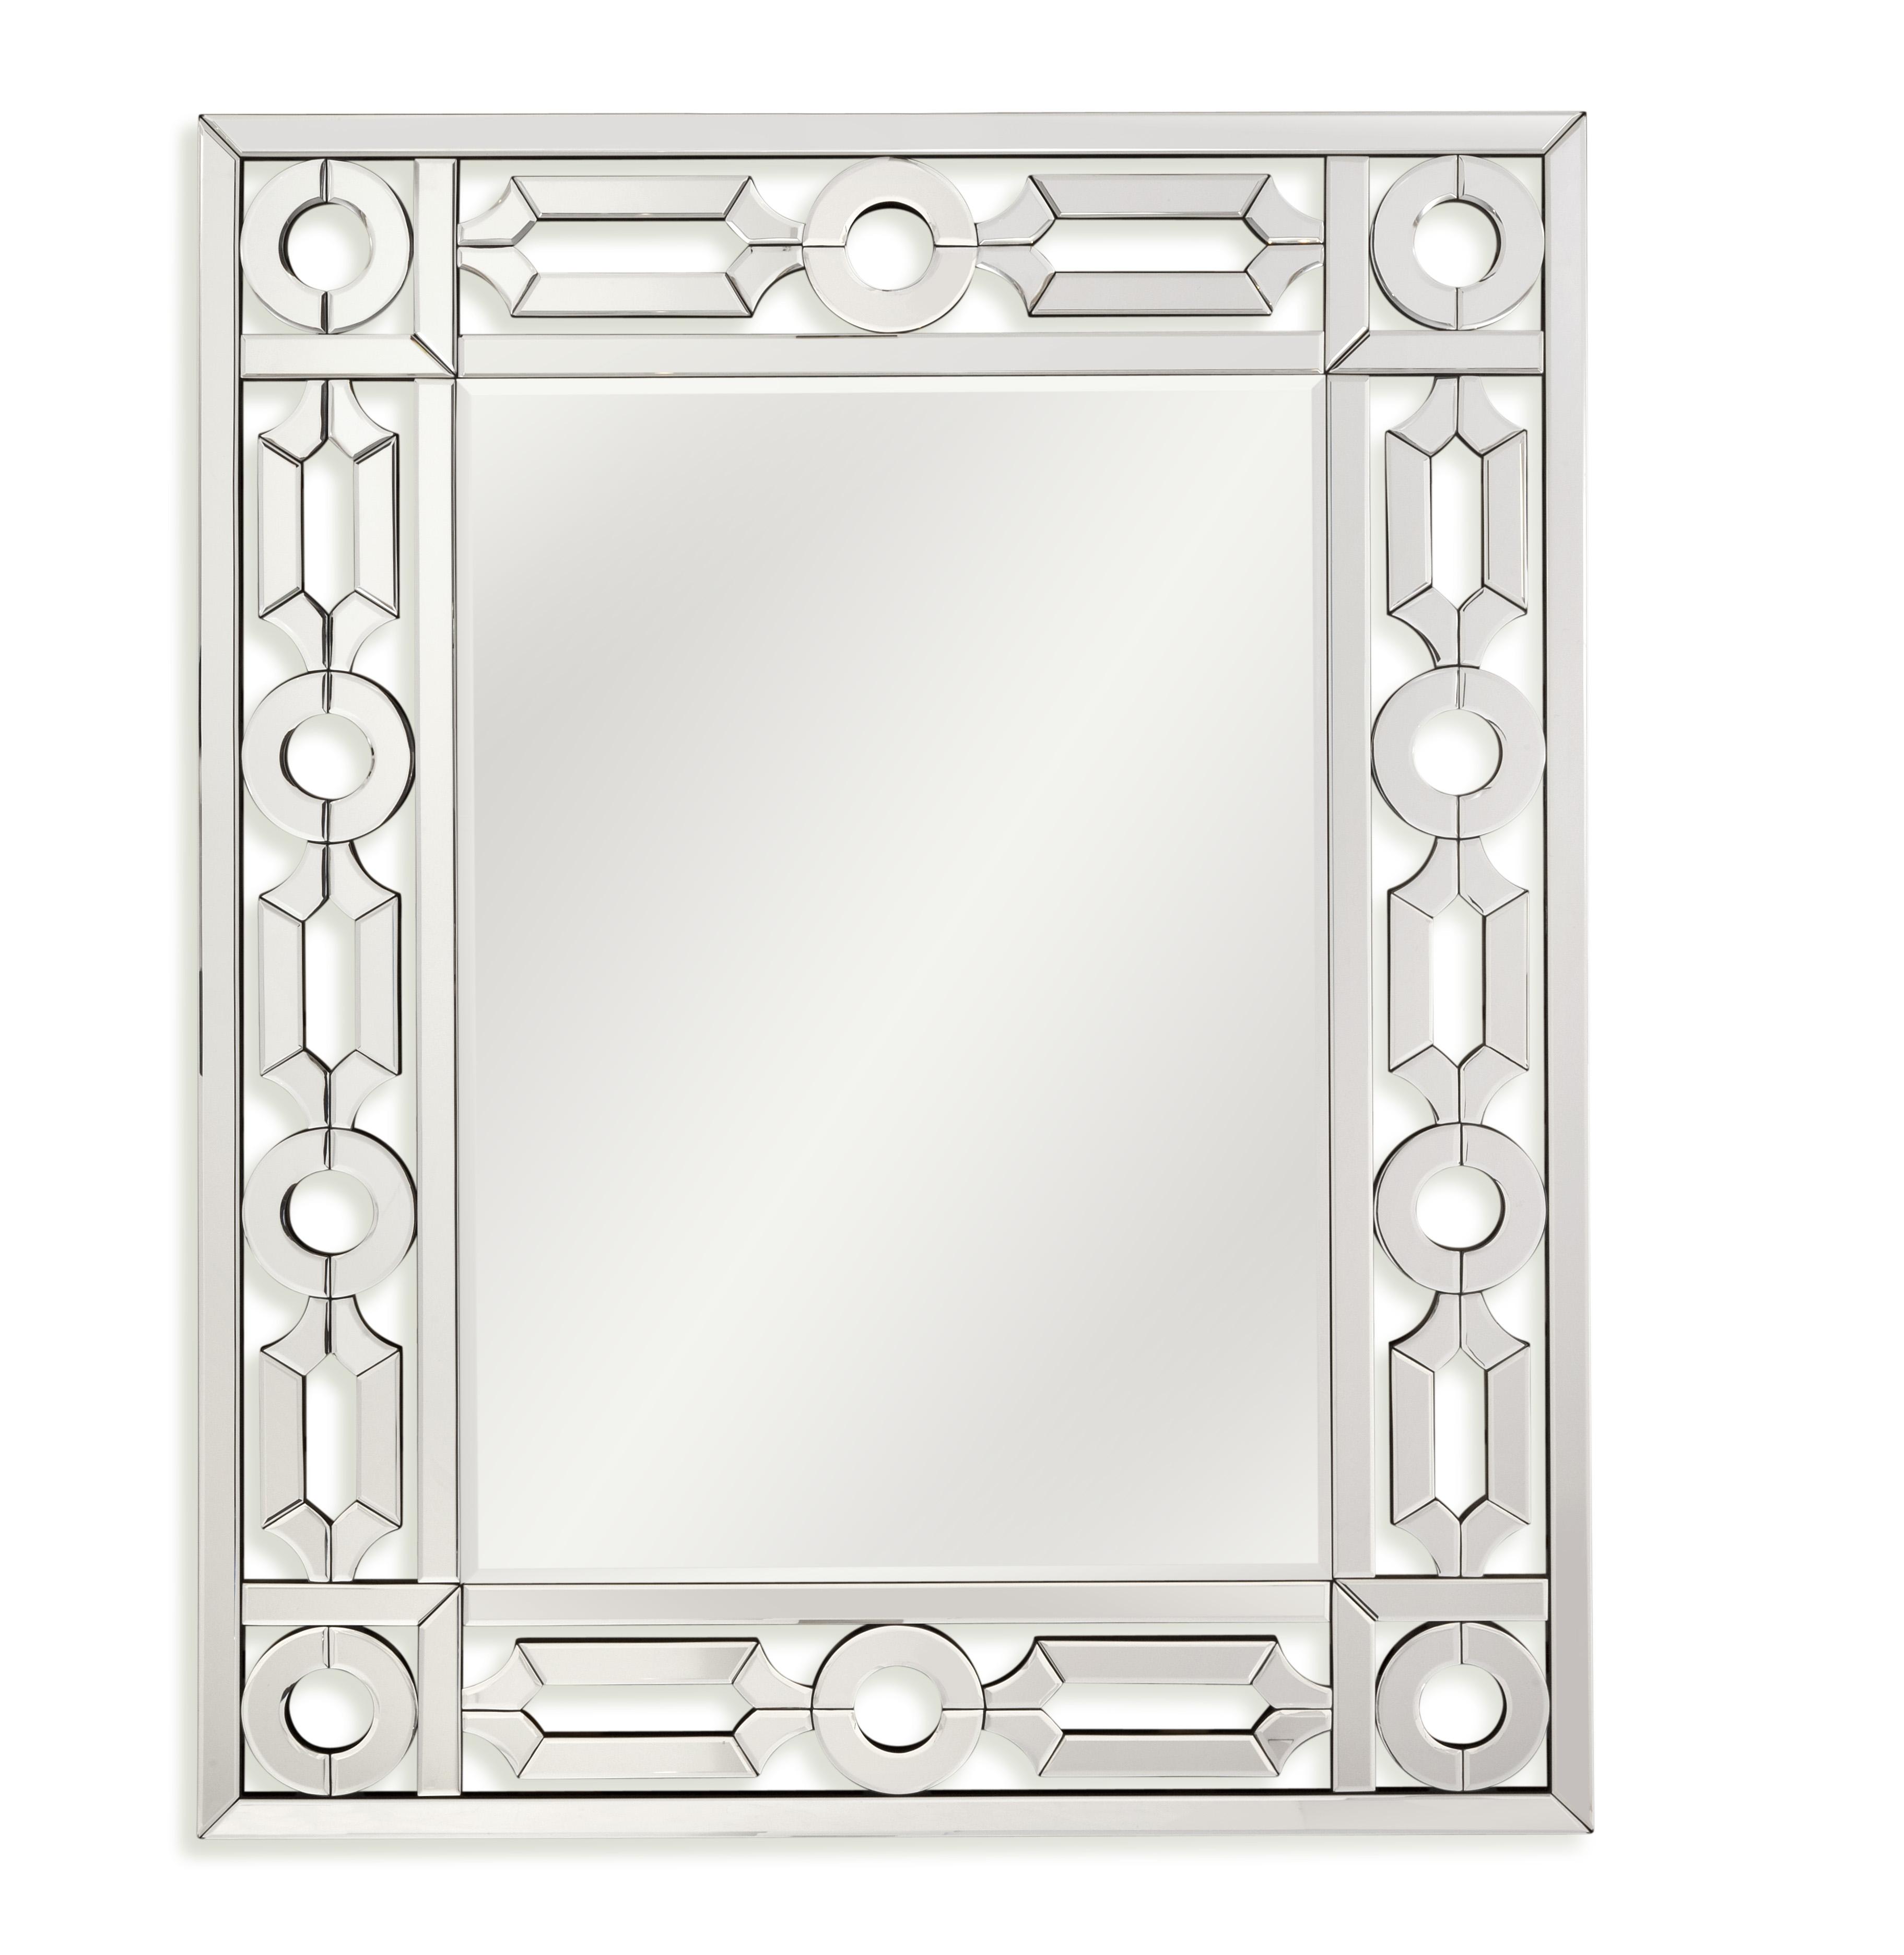 Thoroughly Modern Pilar Wall Mirror by Bassett Mirror at Alison Craig Home Furnishings